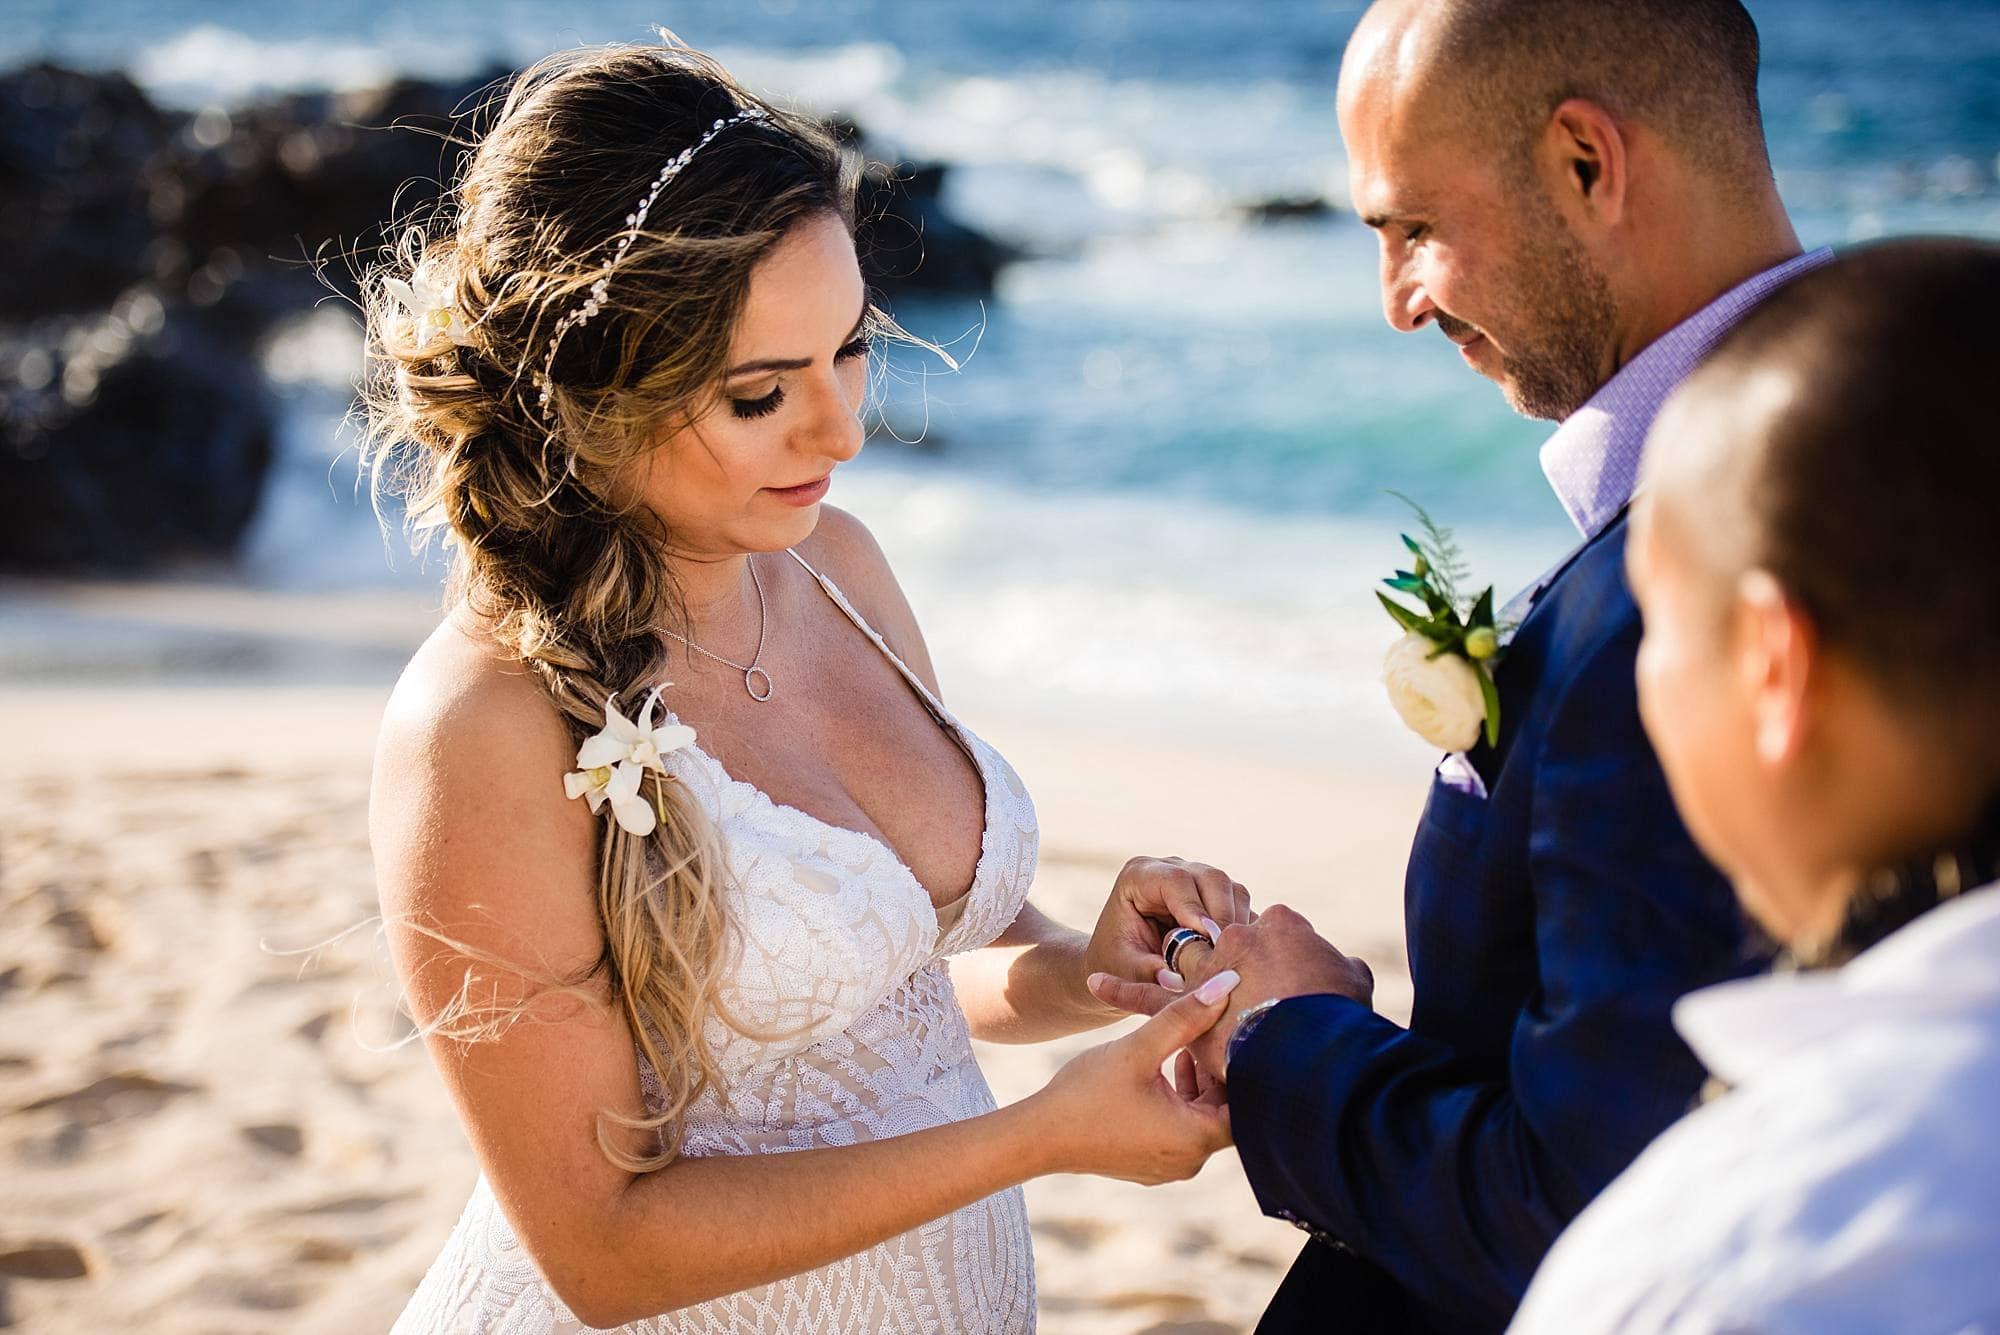 bride placing ring on finger